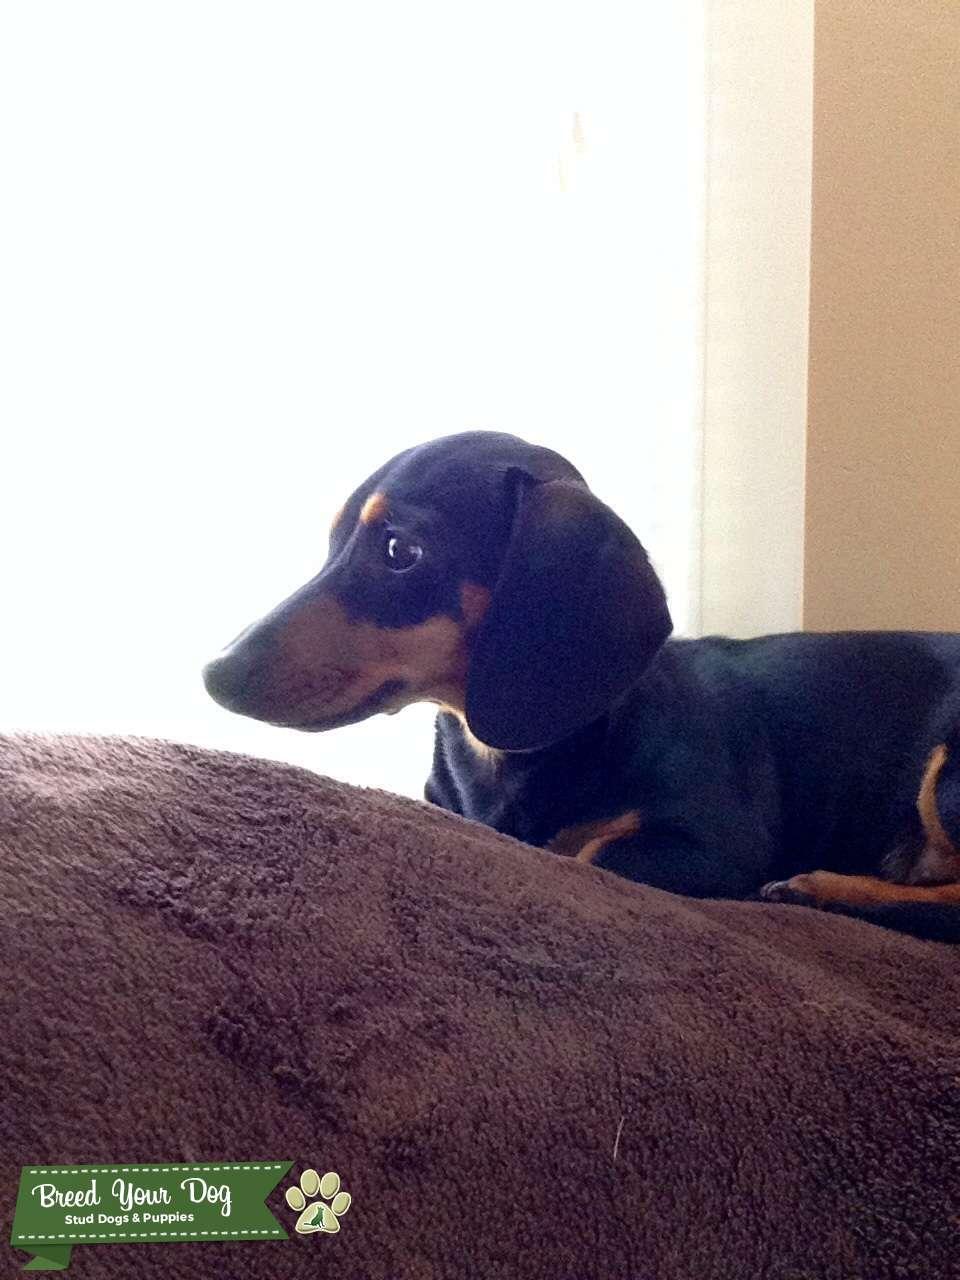 Stud Dog Black And Tan Short Hair Miniature Dachshund